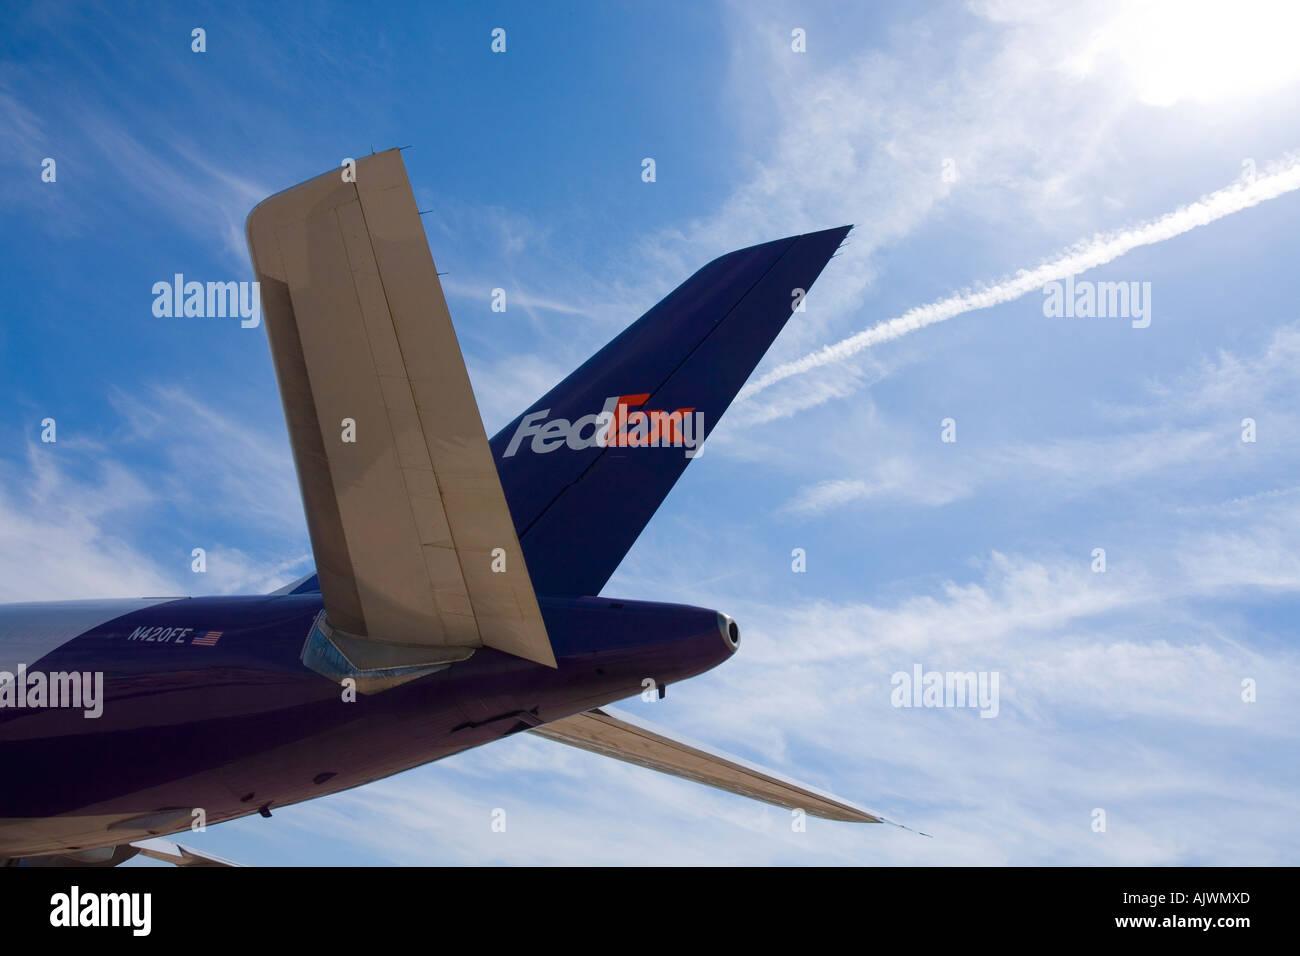 Fedex Aircraft tailplane tail plane airplane aeroplane against blue sky - Stock Image